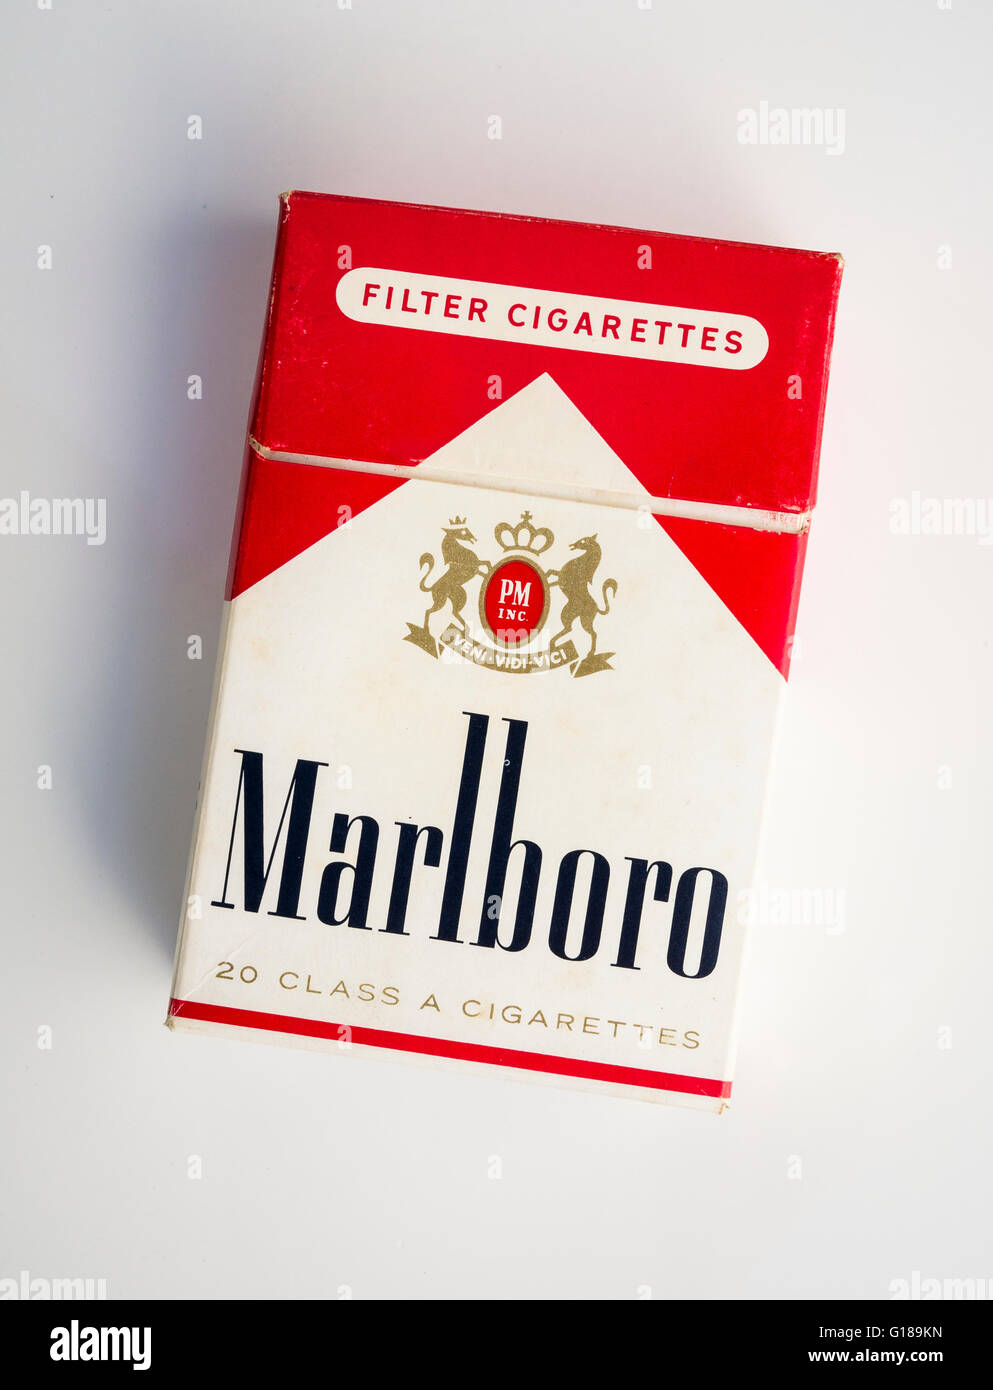 Cigarettes Marlboro Glasgow review